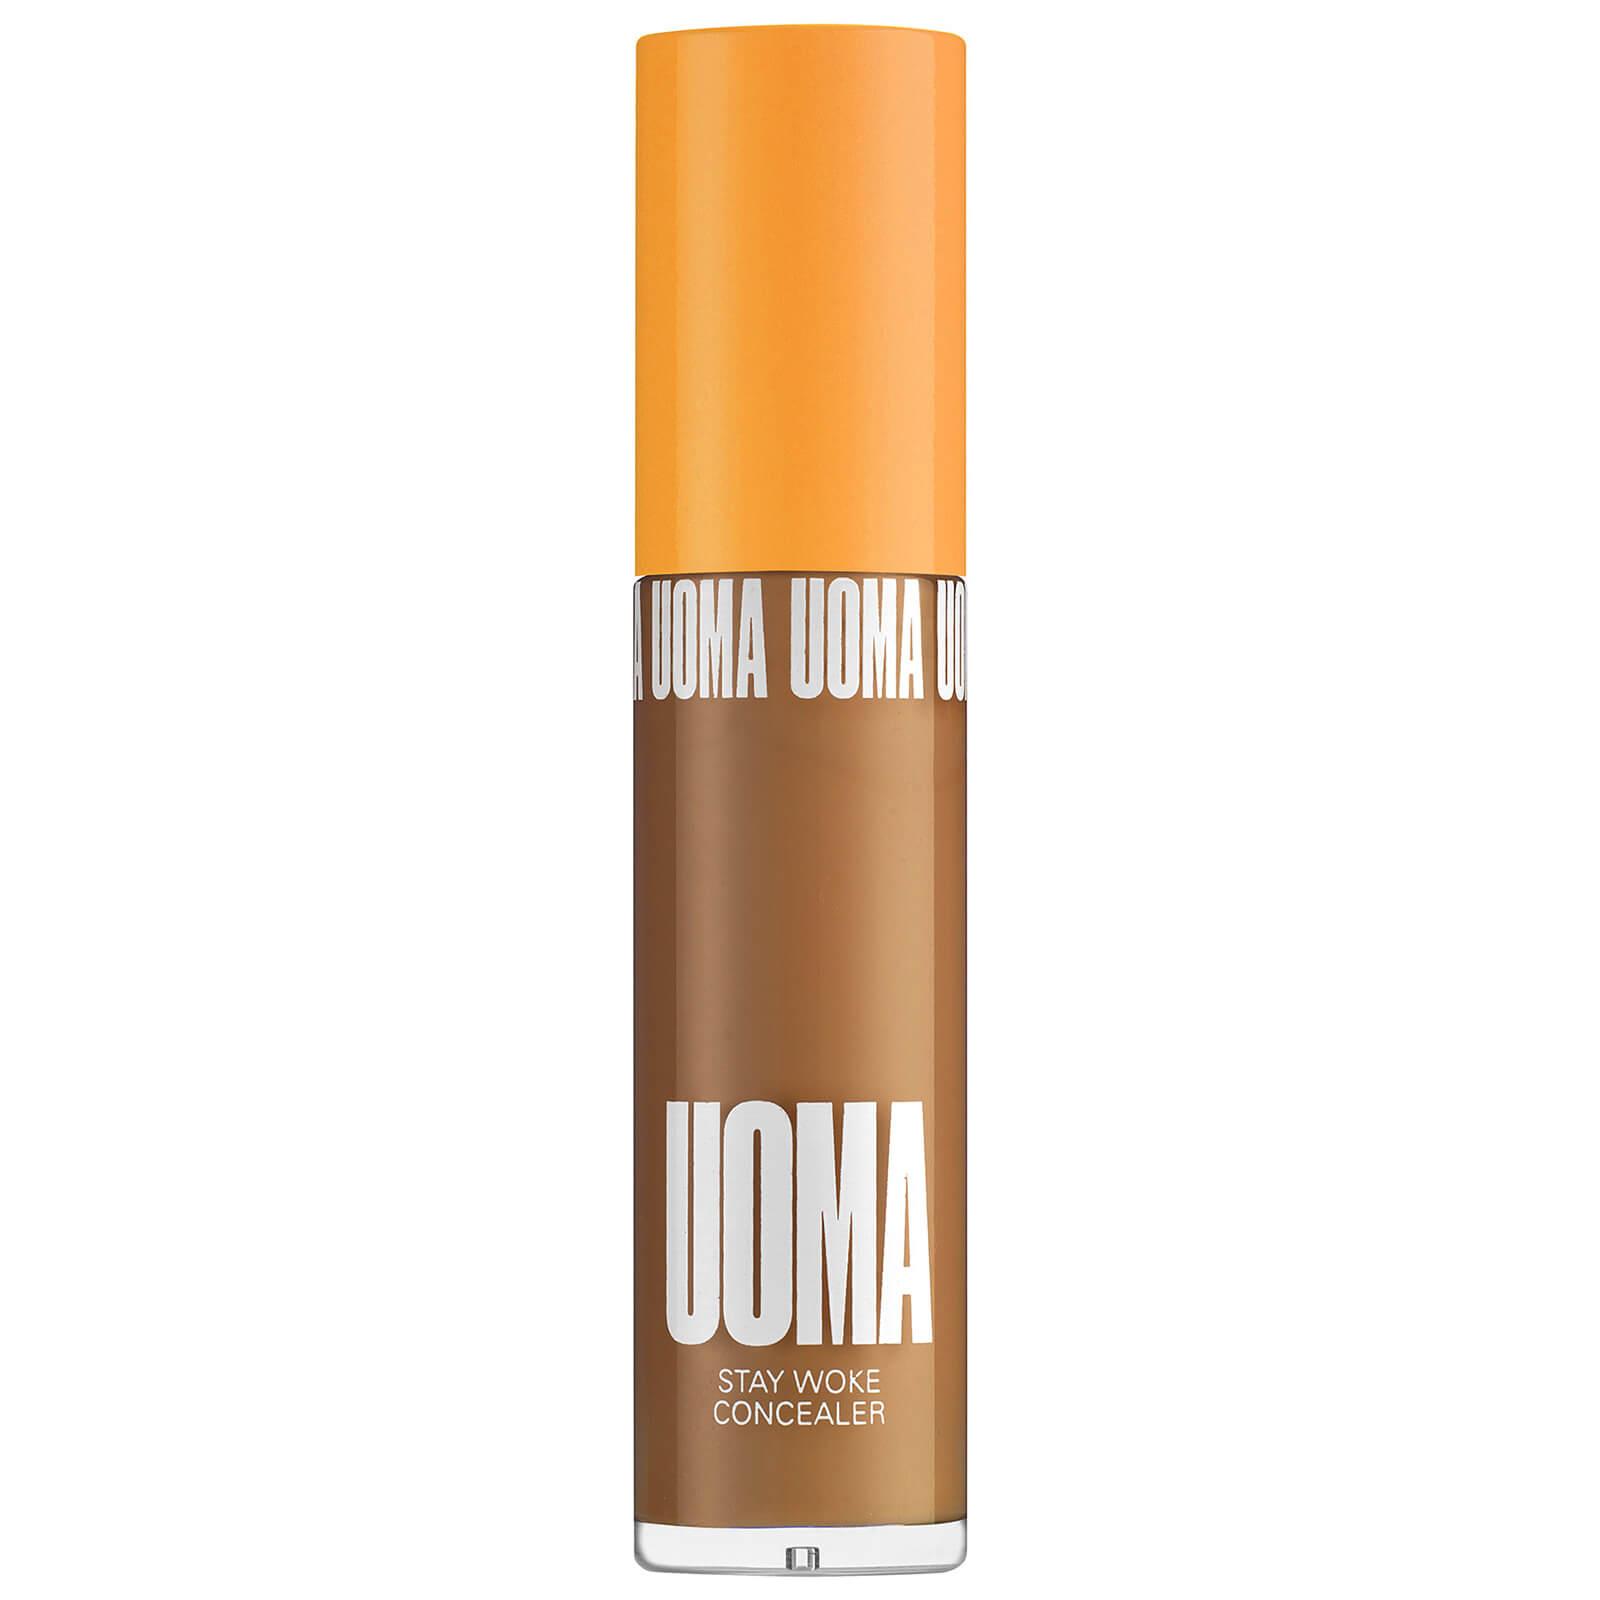 UOMA Beauty Stay Woke Luminous Brightening Concealer 30ml (Various Shades) - Brown Sugar T2